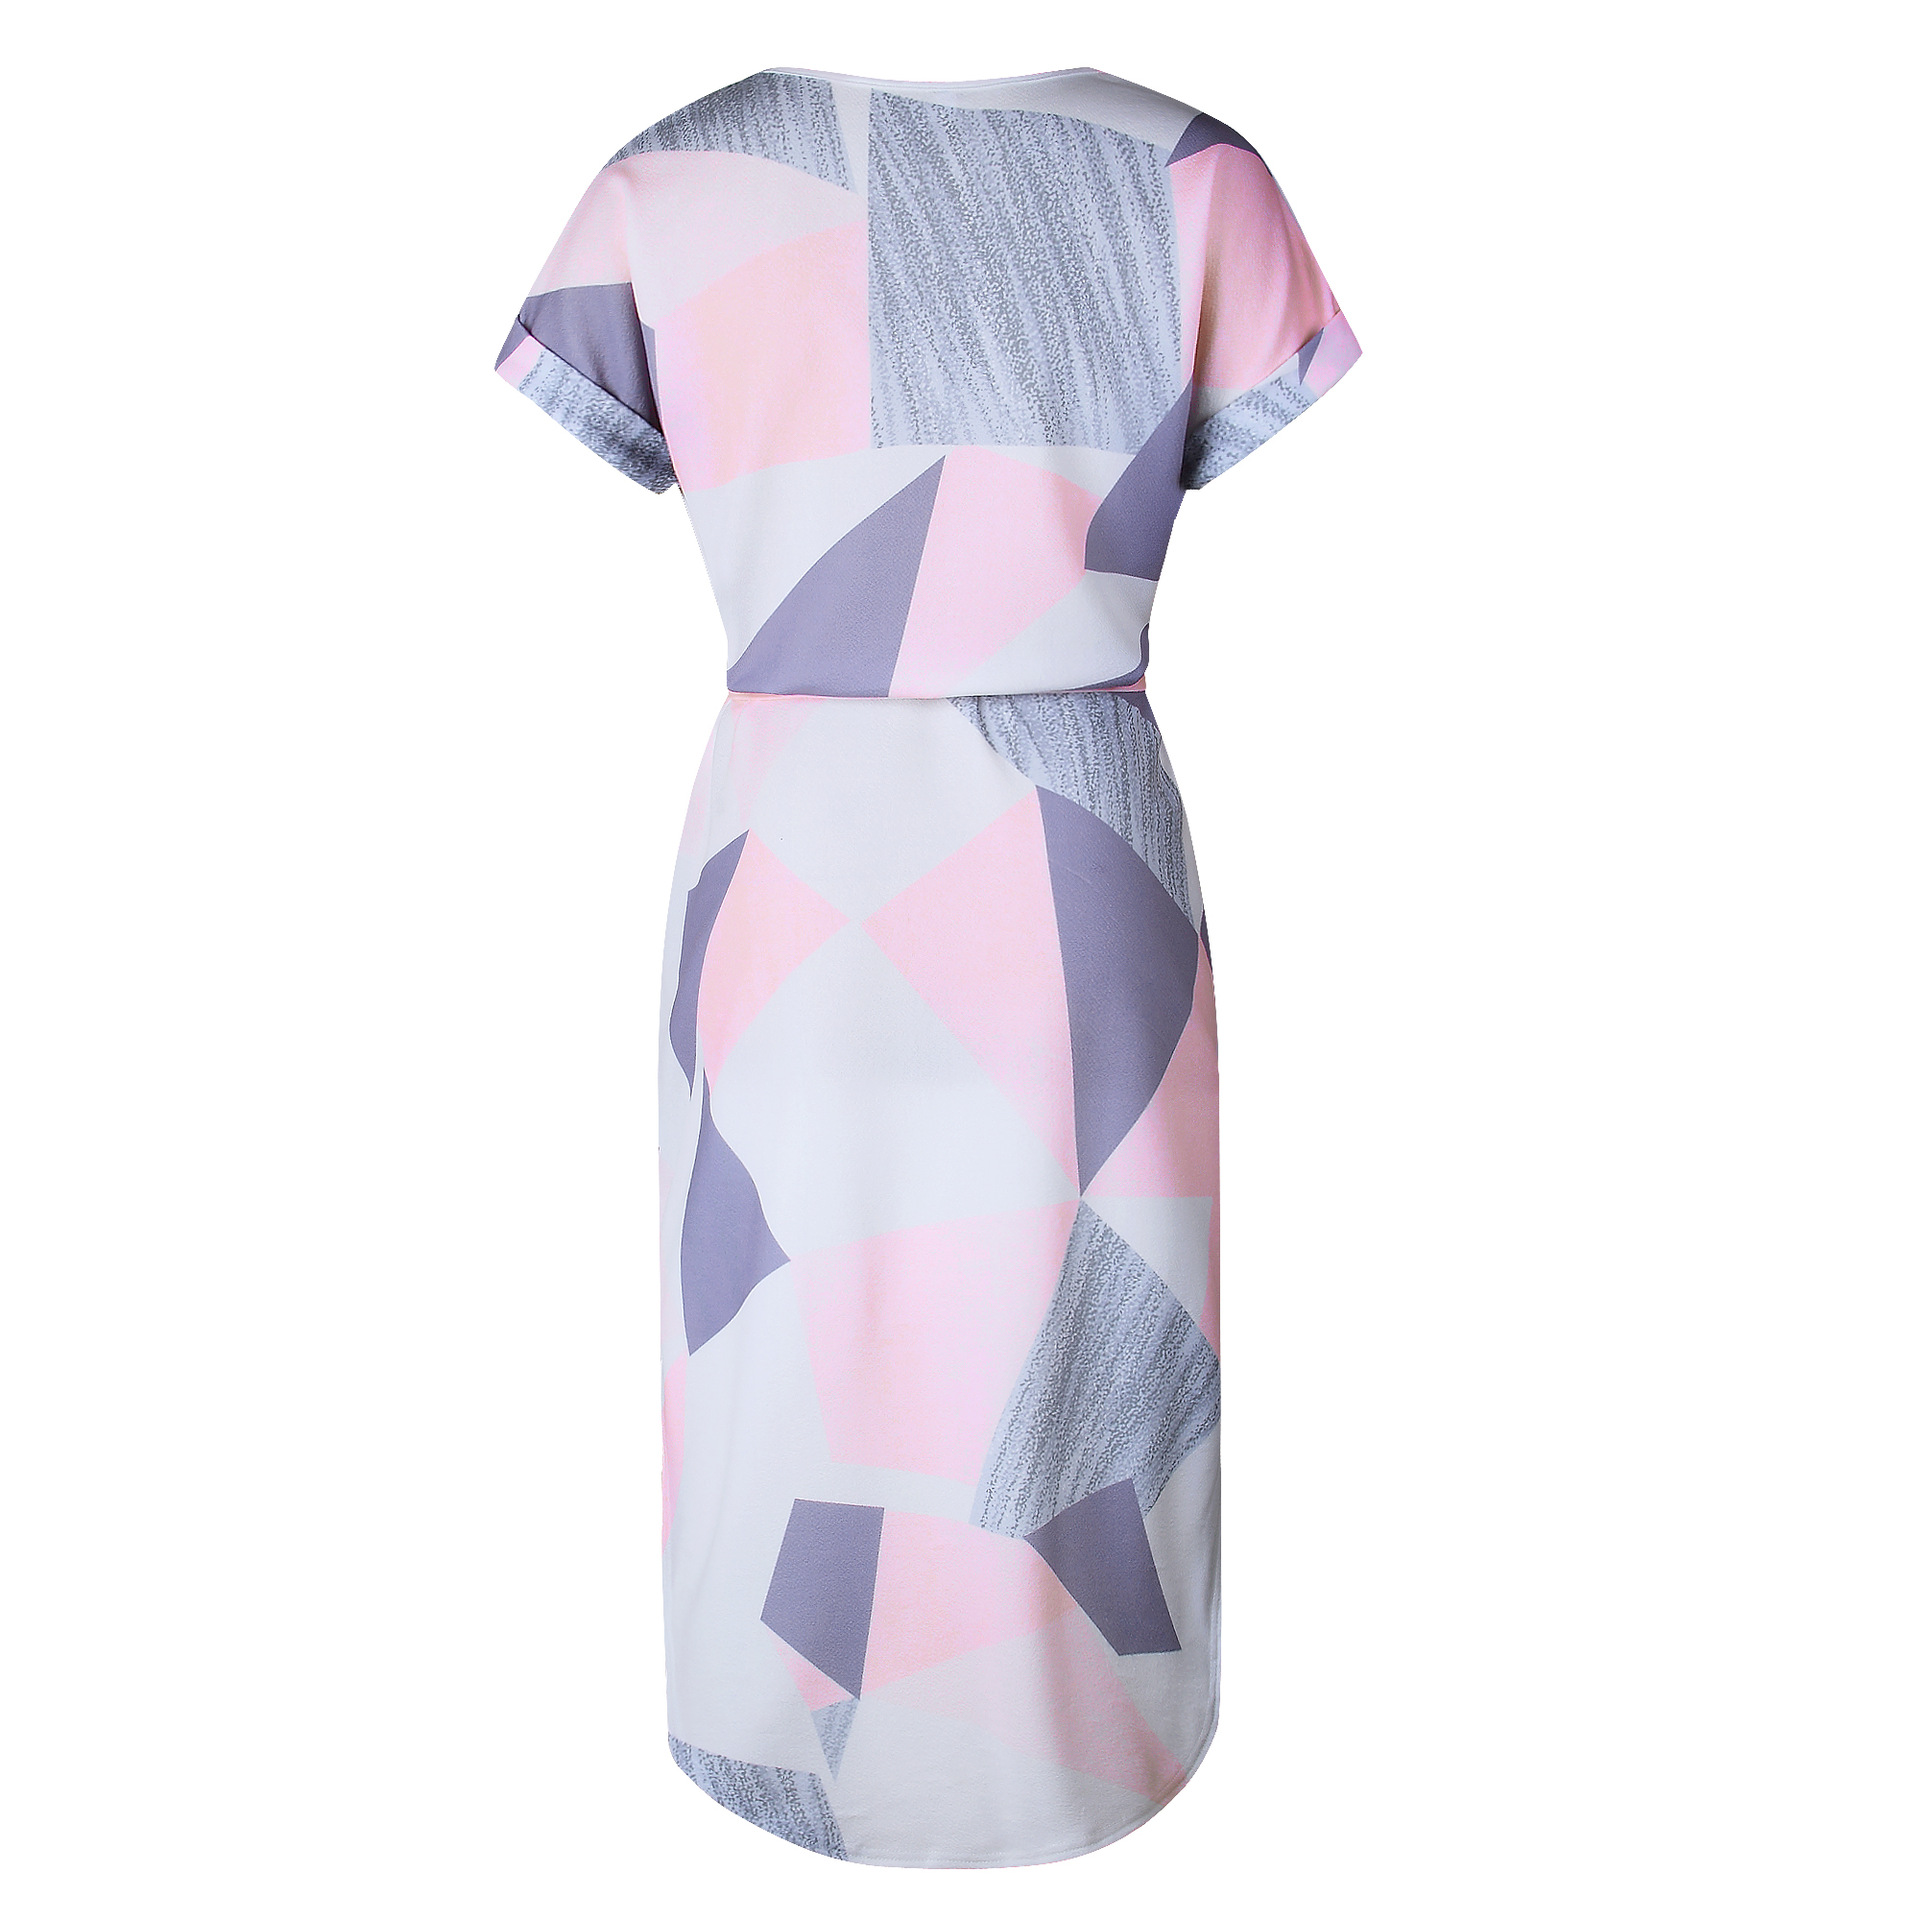 2018 Summer Dress Women Print V Neck Short Sleeve Robe Female Dresses Casual Sashes Midi Dress Ladies Elegant Vestidos Dropship 49